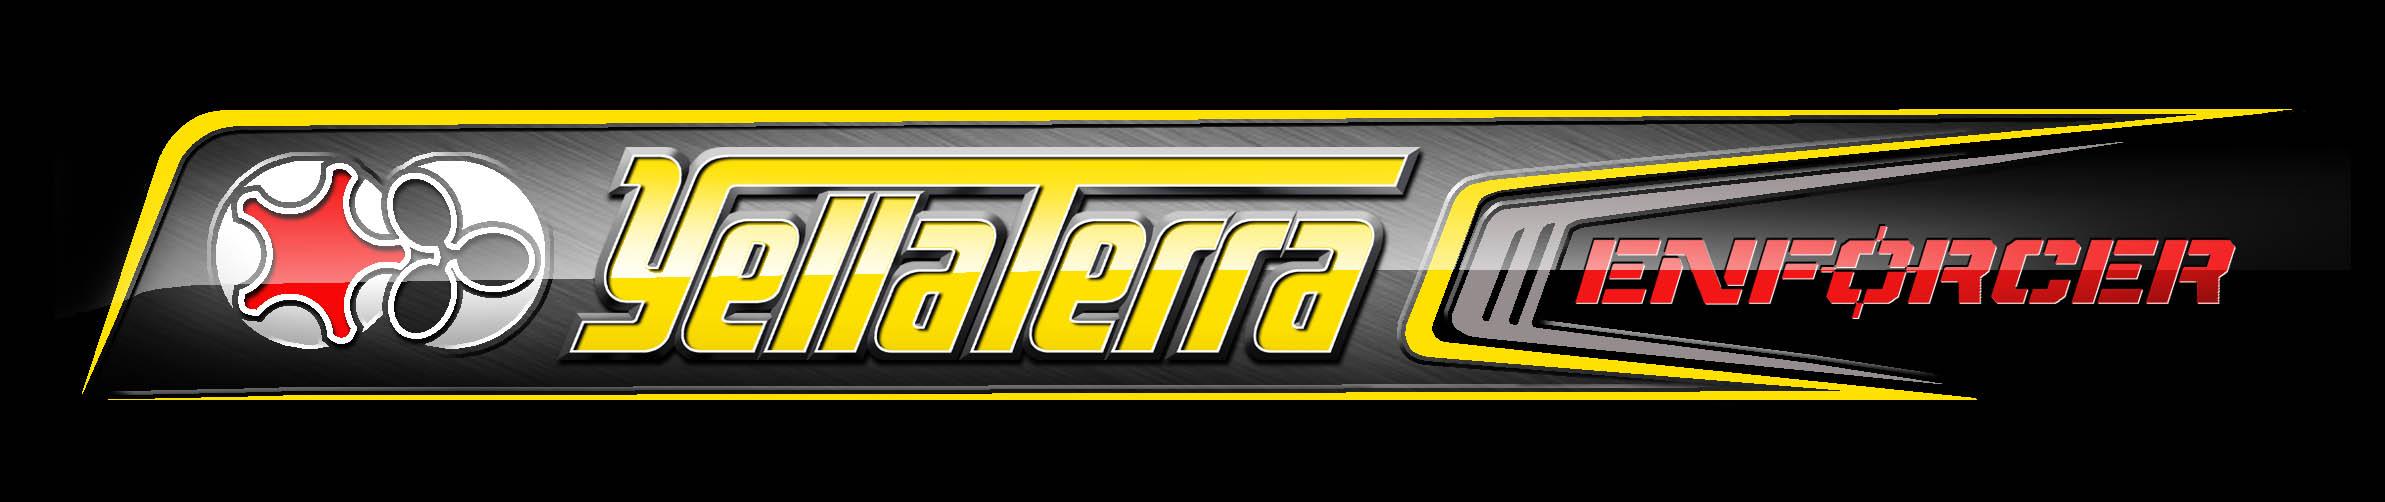 hi-res-blower-logo-002.jpg